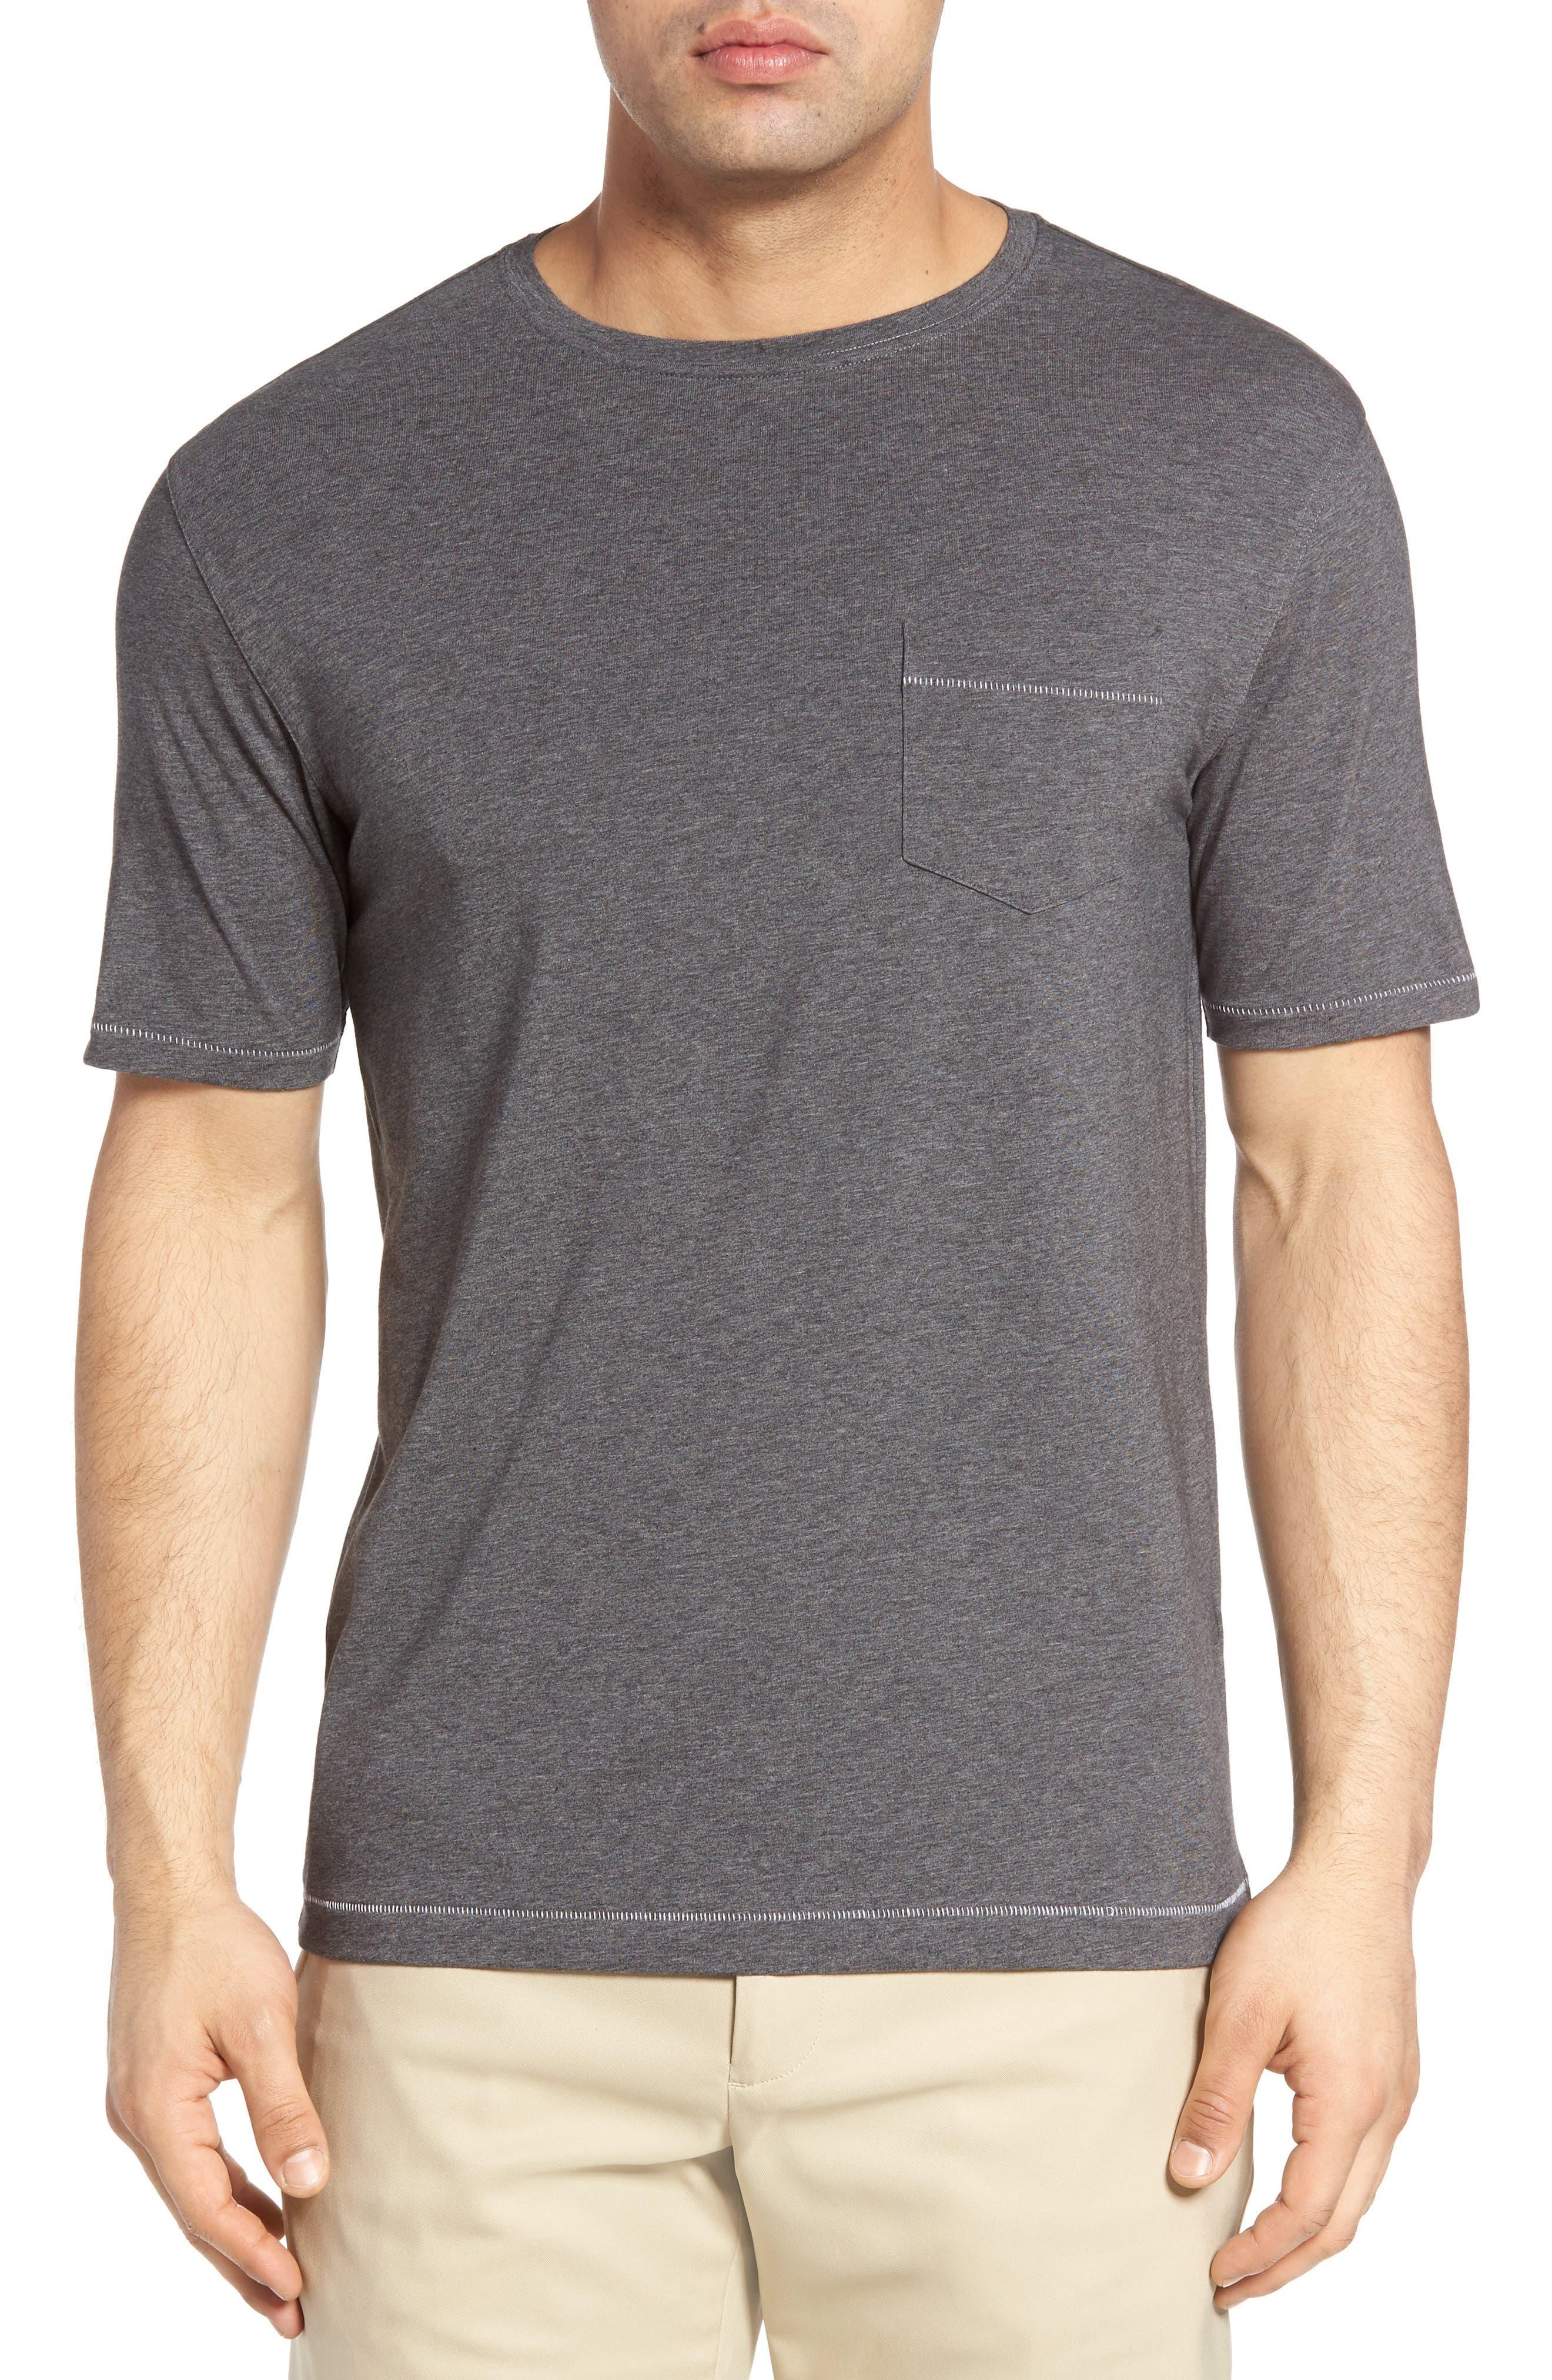 Bobby Jones R18 Pocket T-Shirt